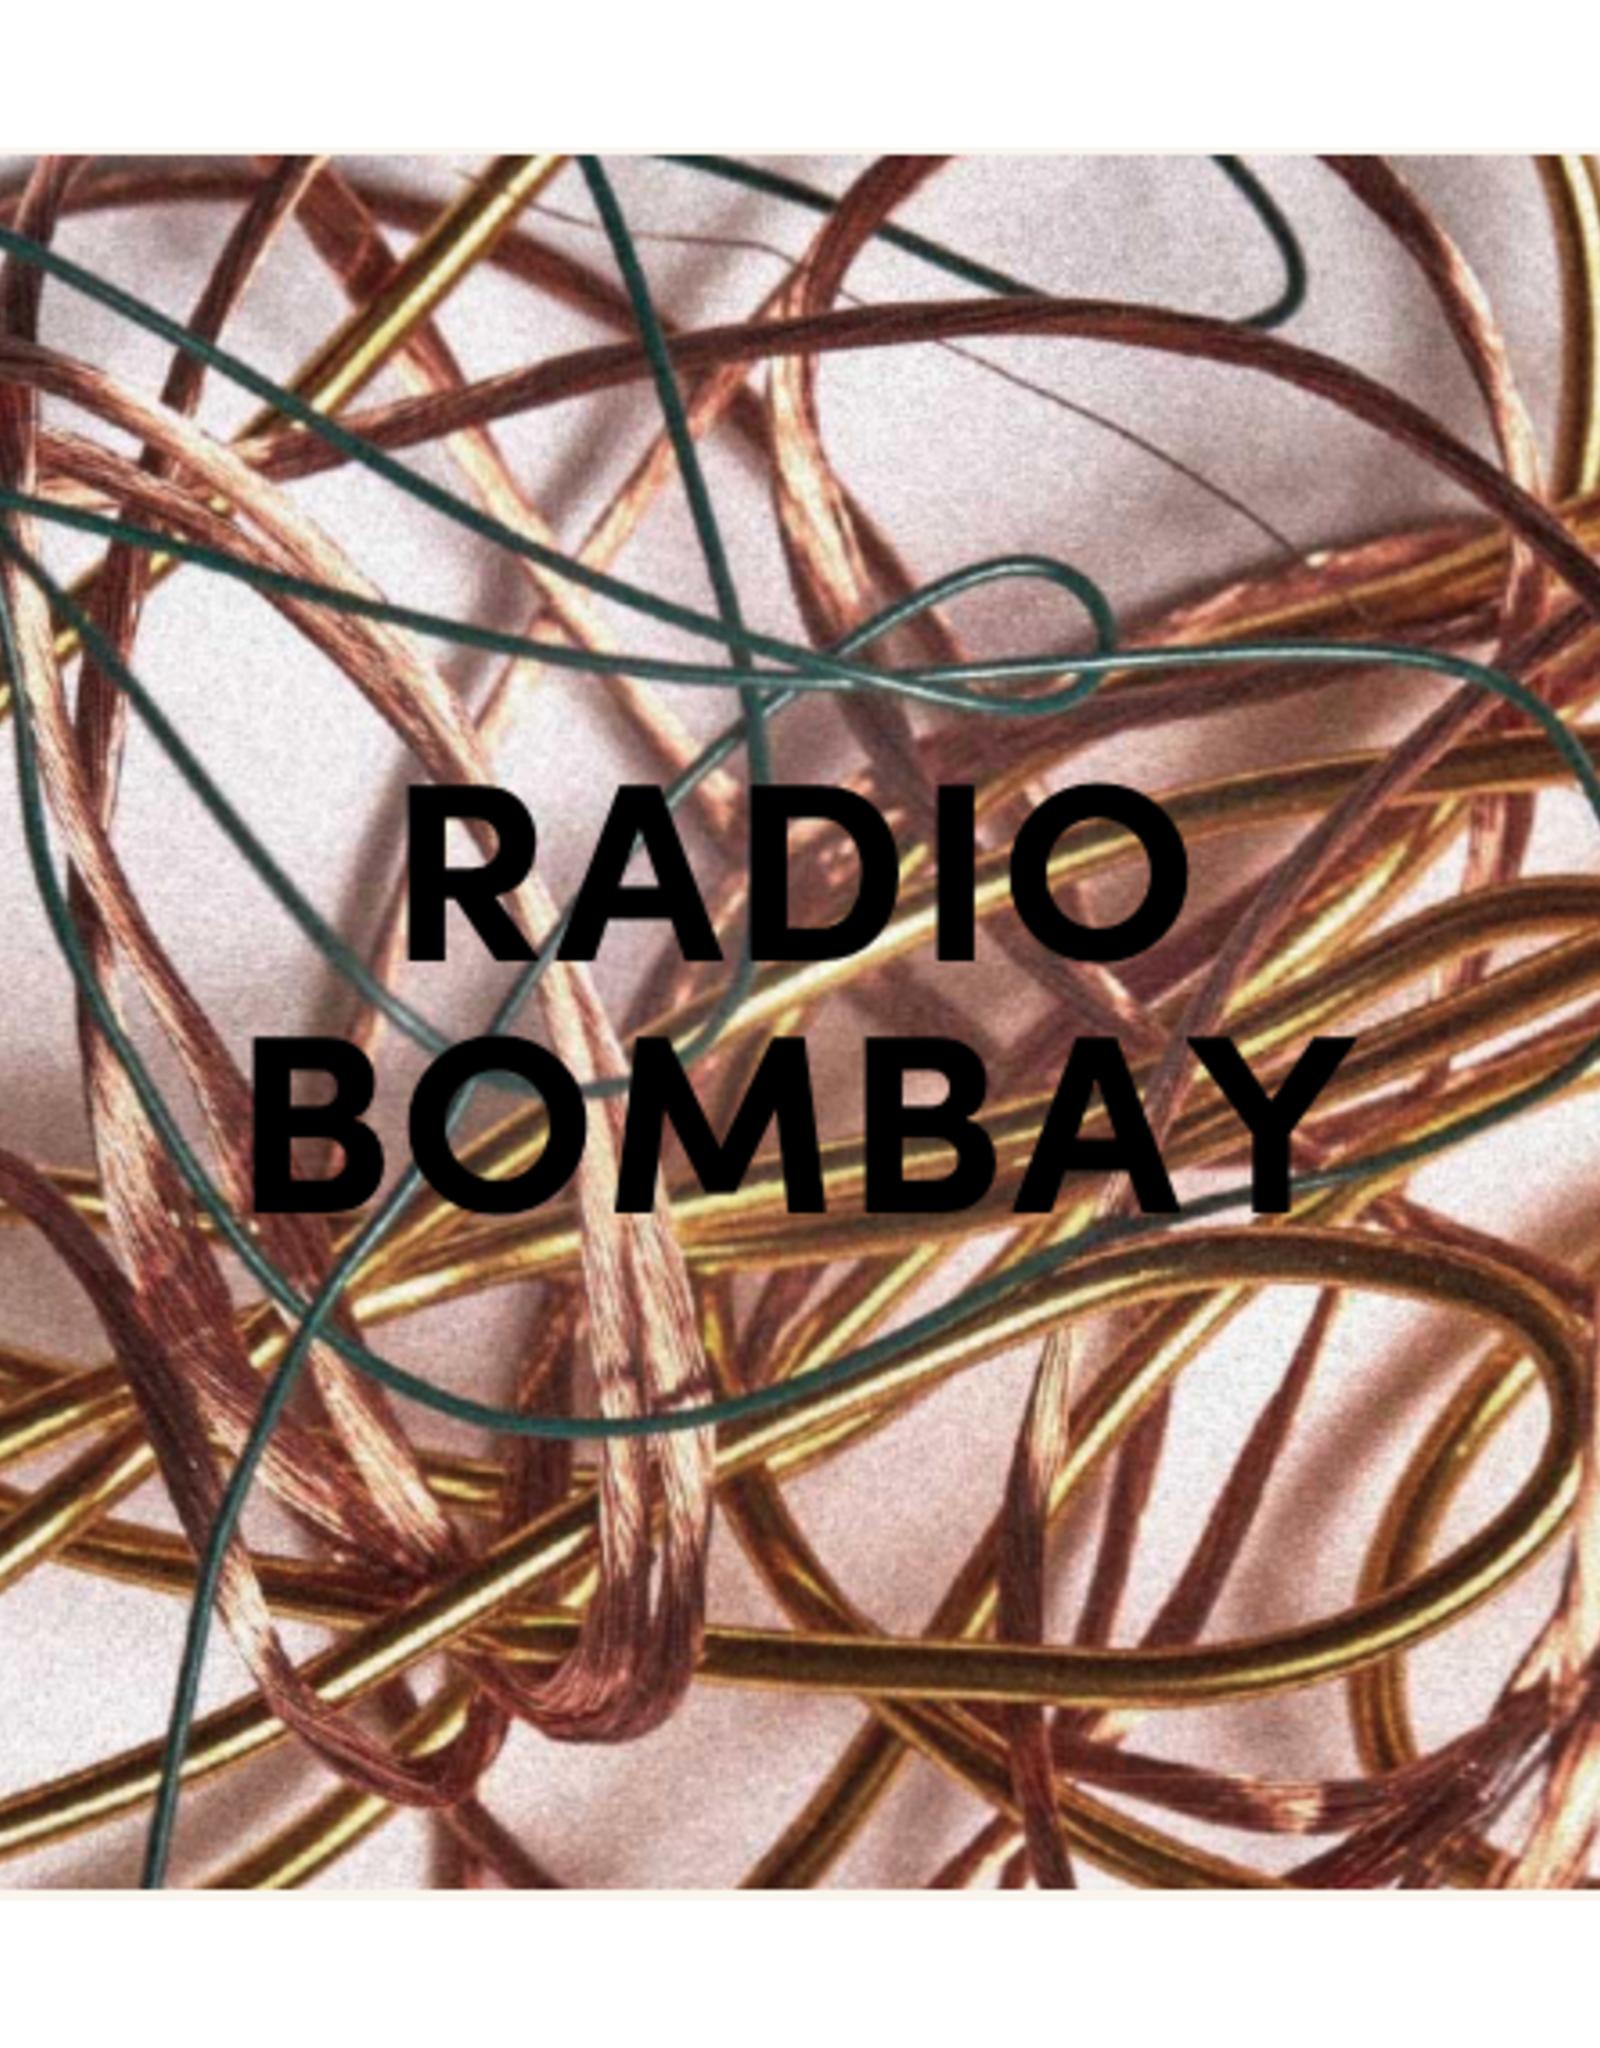 D.S. & DURGA Radio Bombay - Pocket Perfume - 10mL